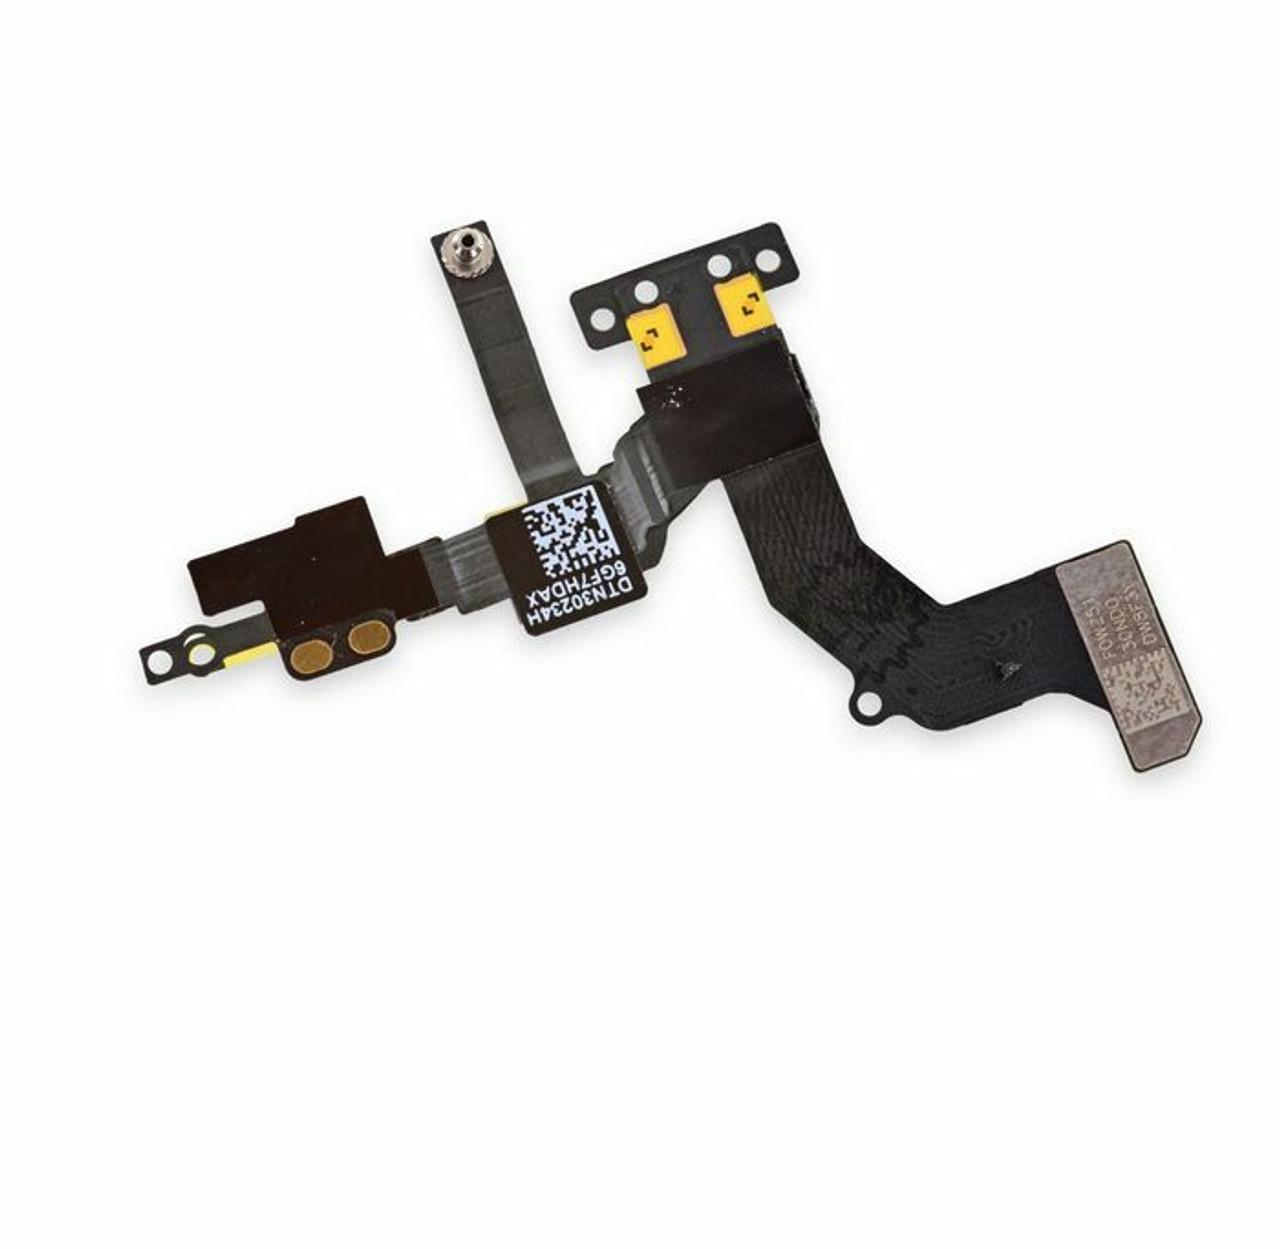 OEM SPEC Proximity Sensor Light Motion Flex Cable Front Face Camera For iPhone 5